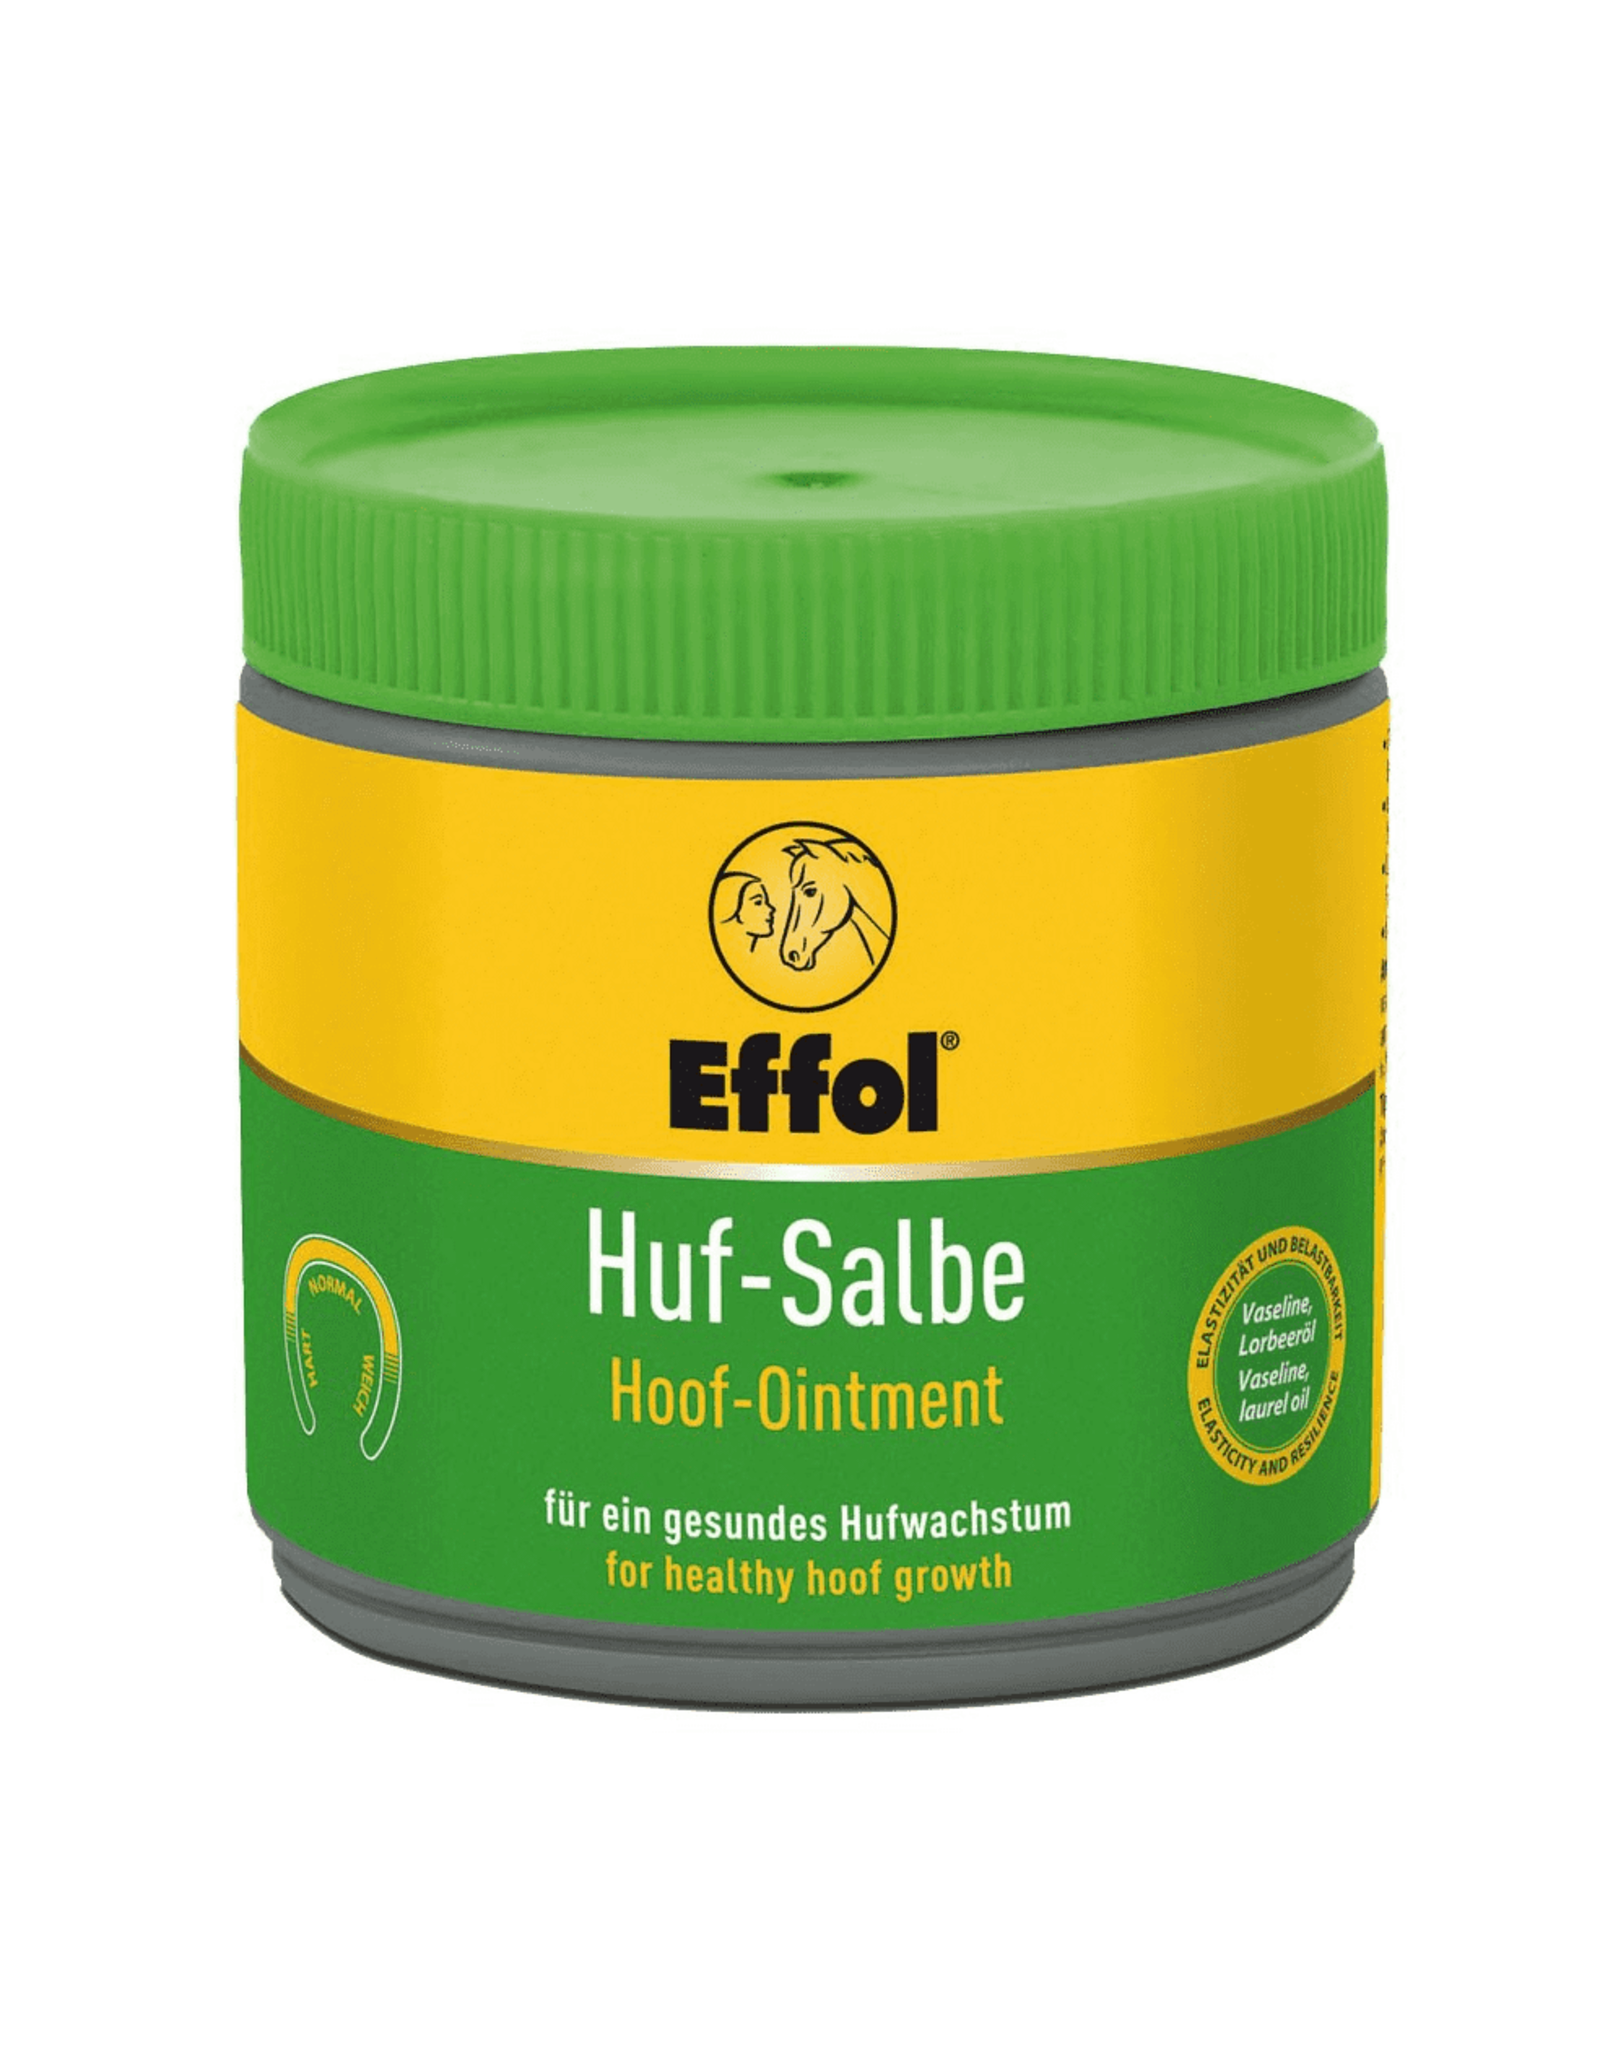 Effol Hoof Ointment Huf-Salbe Green 500ml